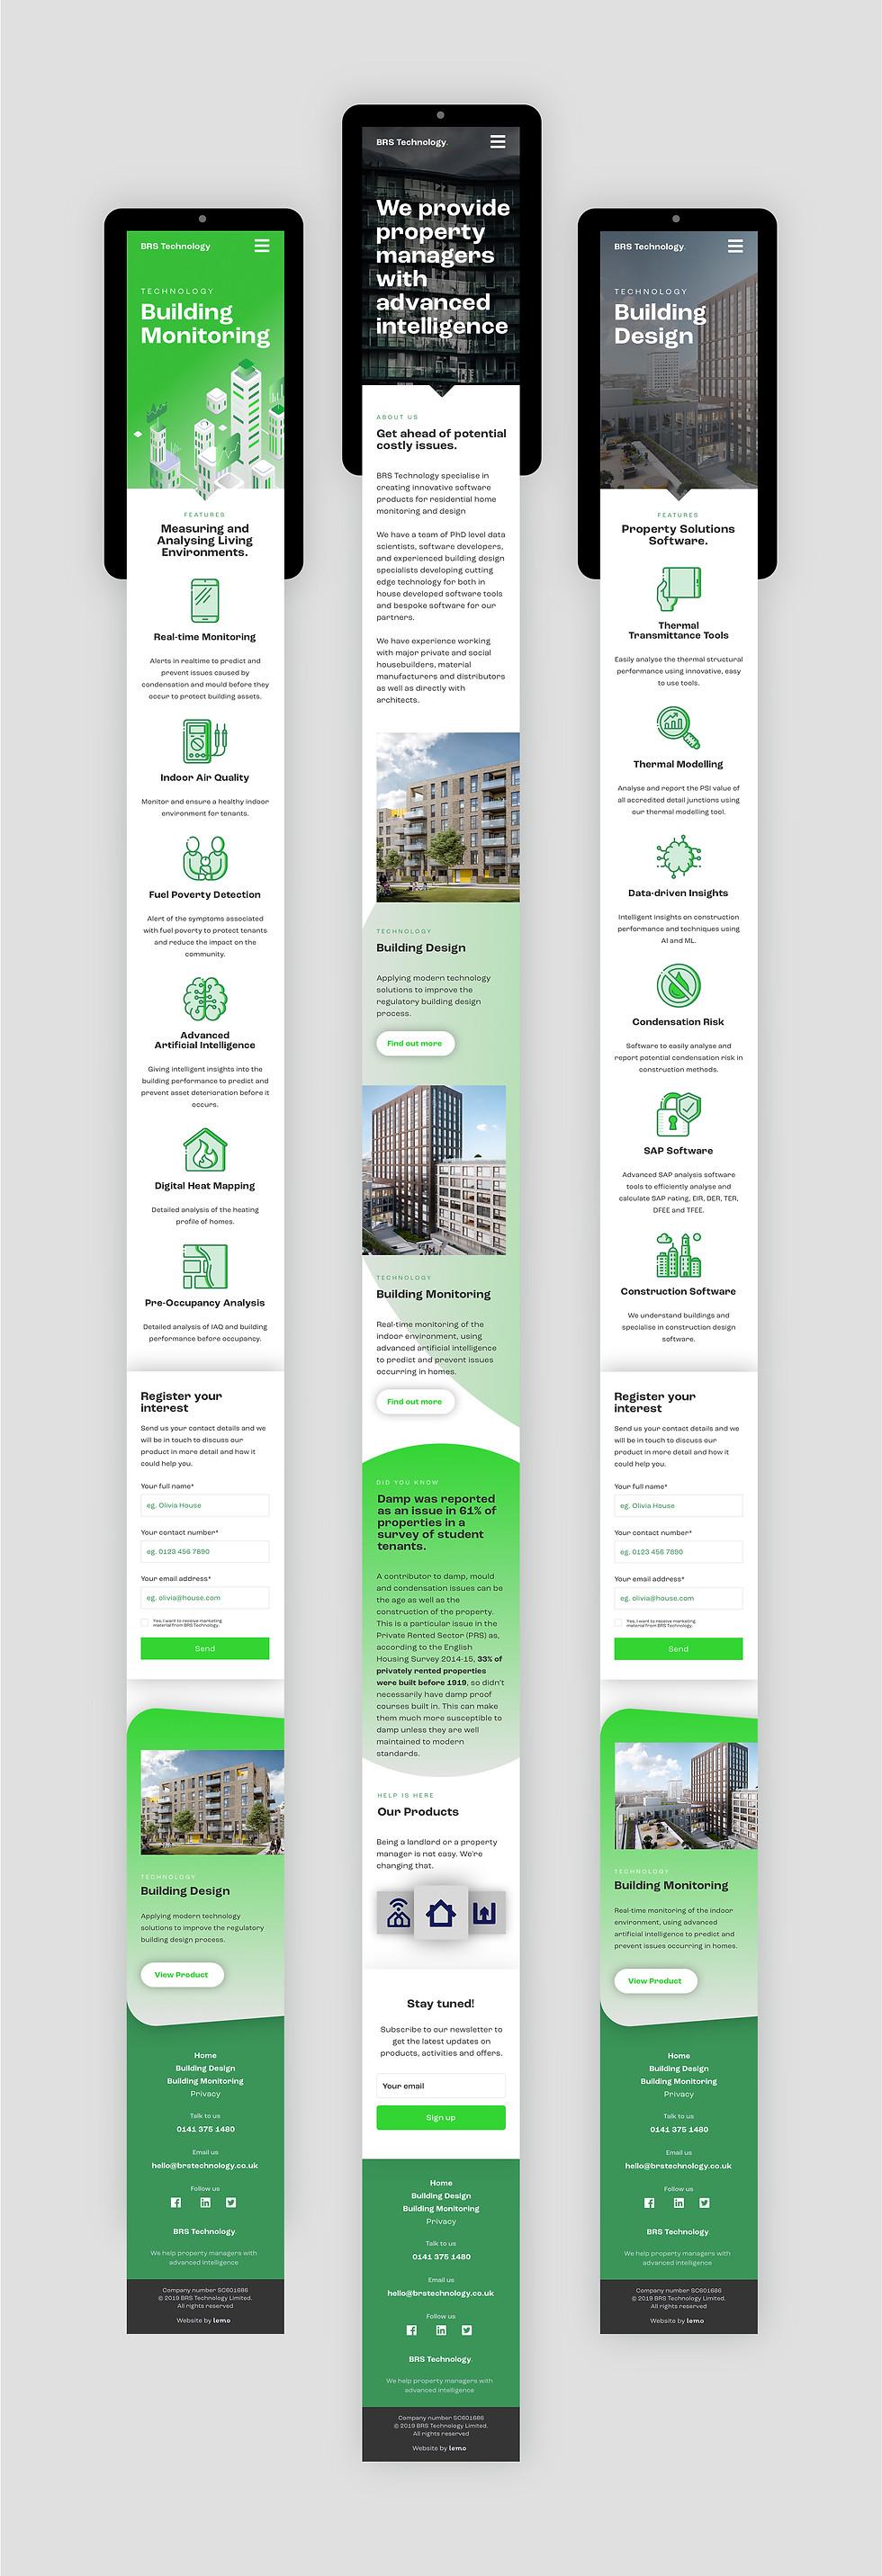 brs_technology-website_on_mobile_present